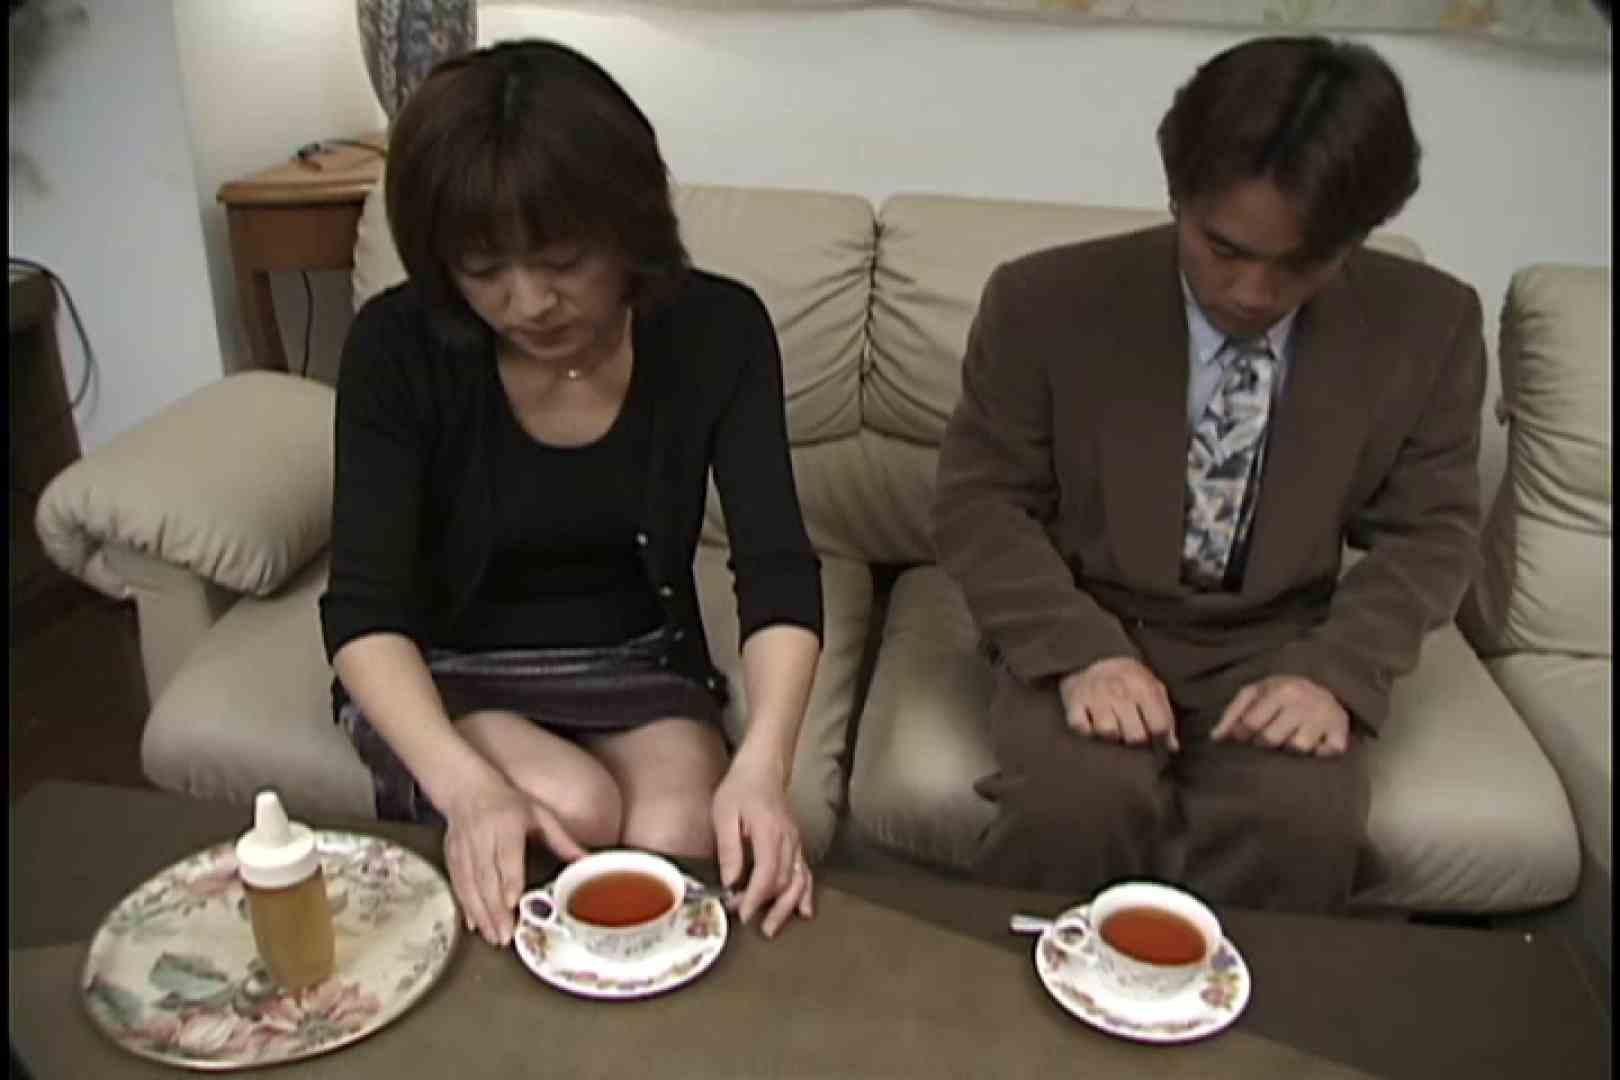 無修正エロ動画:昼間の奥様は欲求不満 ~石川麻紀~:大奥